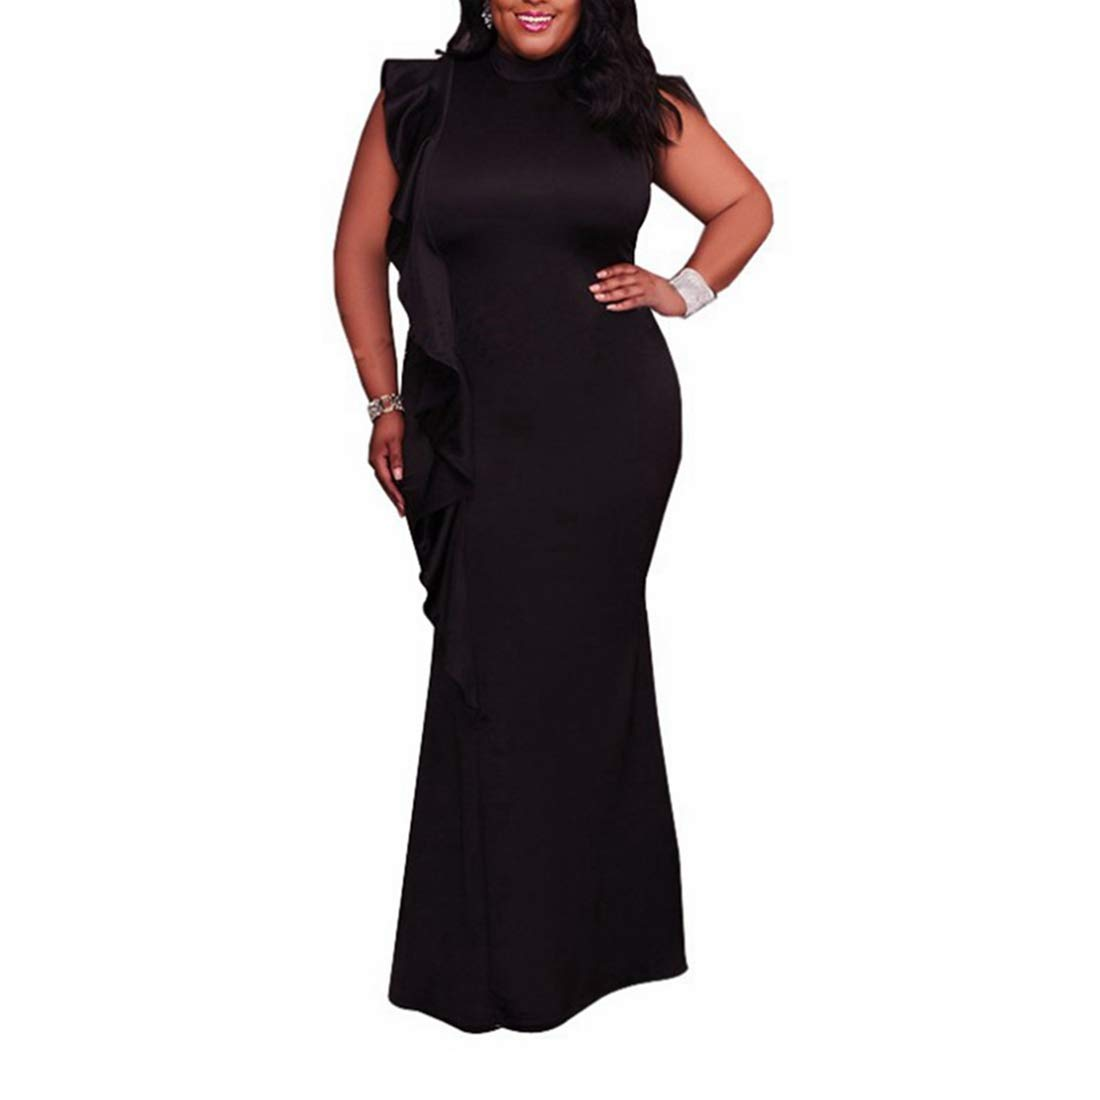 Black Sububblepper Women's Plus Sleeveless Ruffle Solid Bodycon Long Maxi Dress Party Dresses (color   Black, Size   XXL)